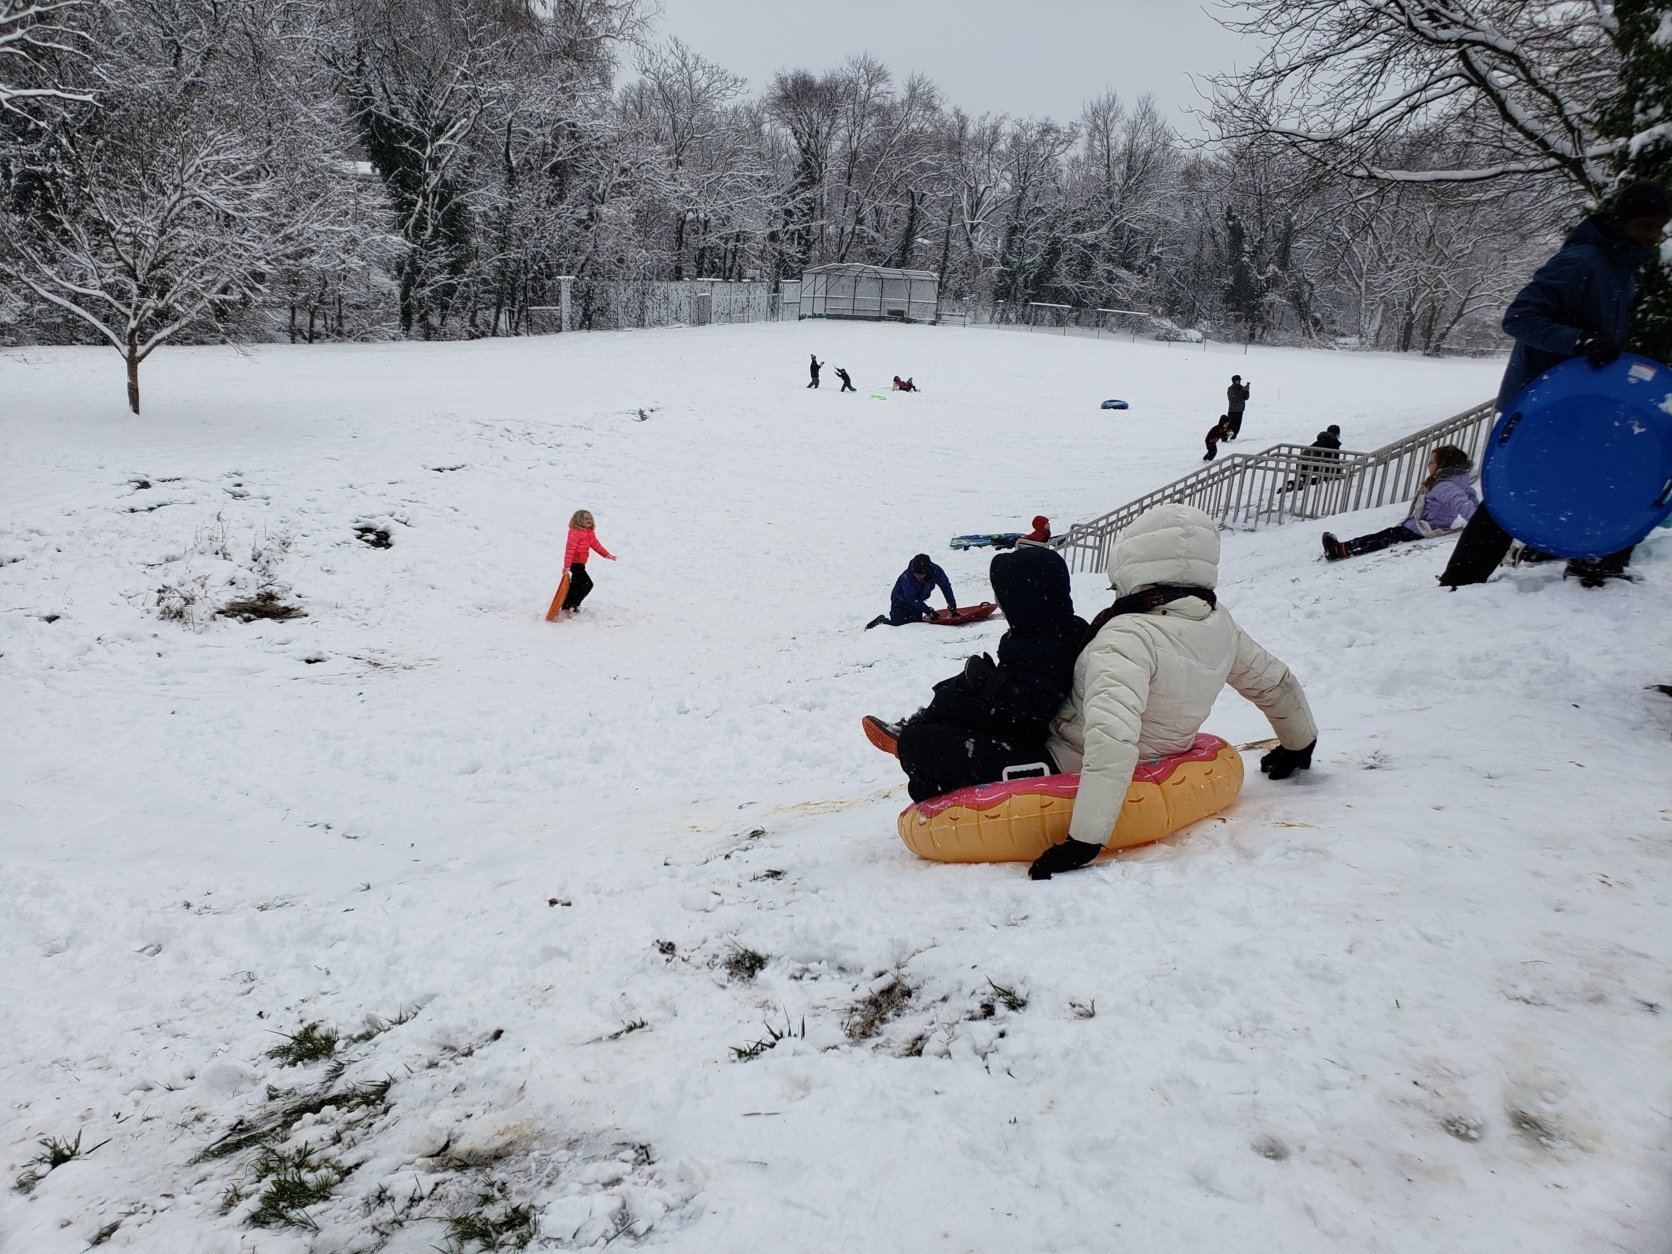 Families sled at Angel Park in Alexandria, Virginia on Jan. 13, 2019. (WTOP/Colleen Kelleher)